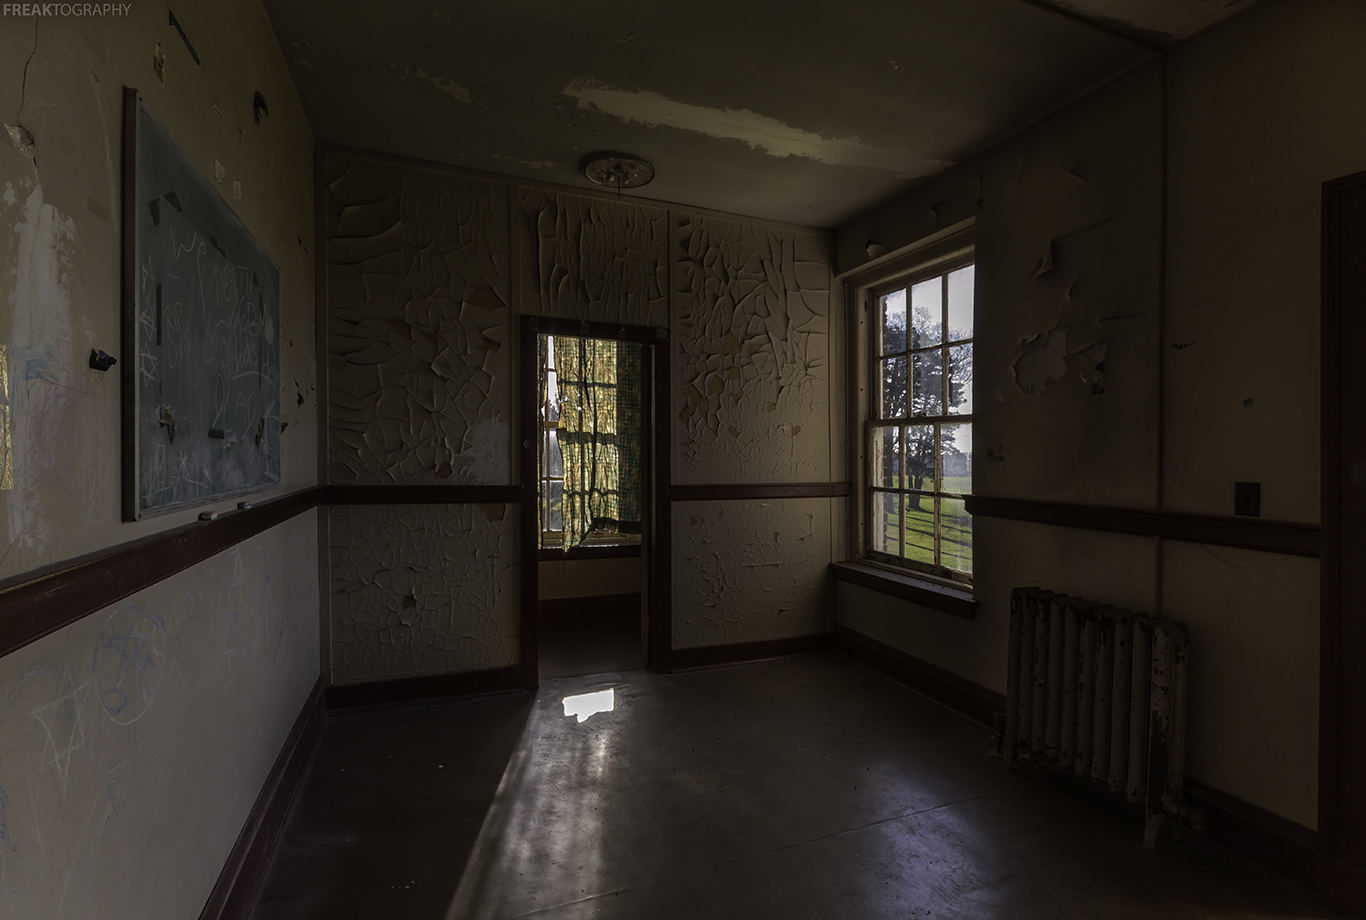 Corner Of Hospital Room